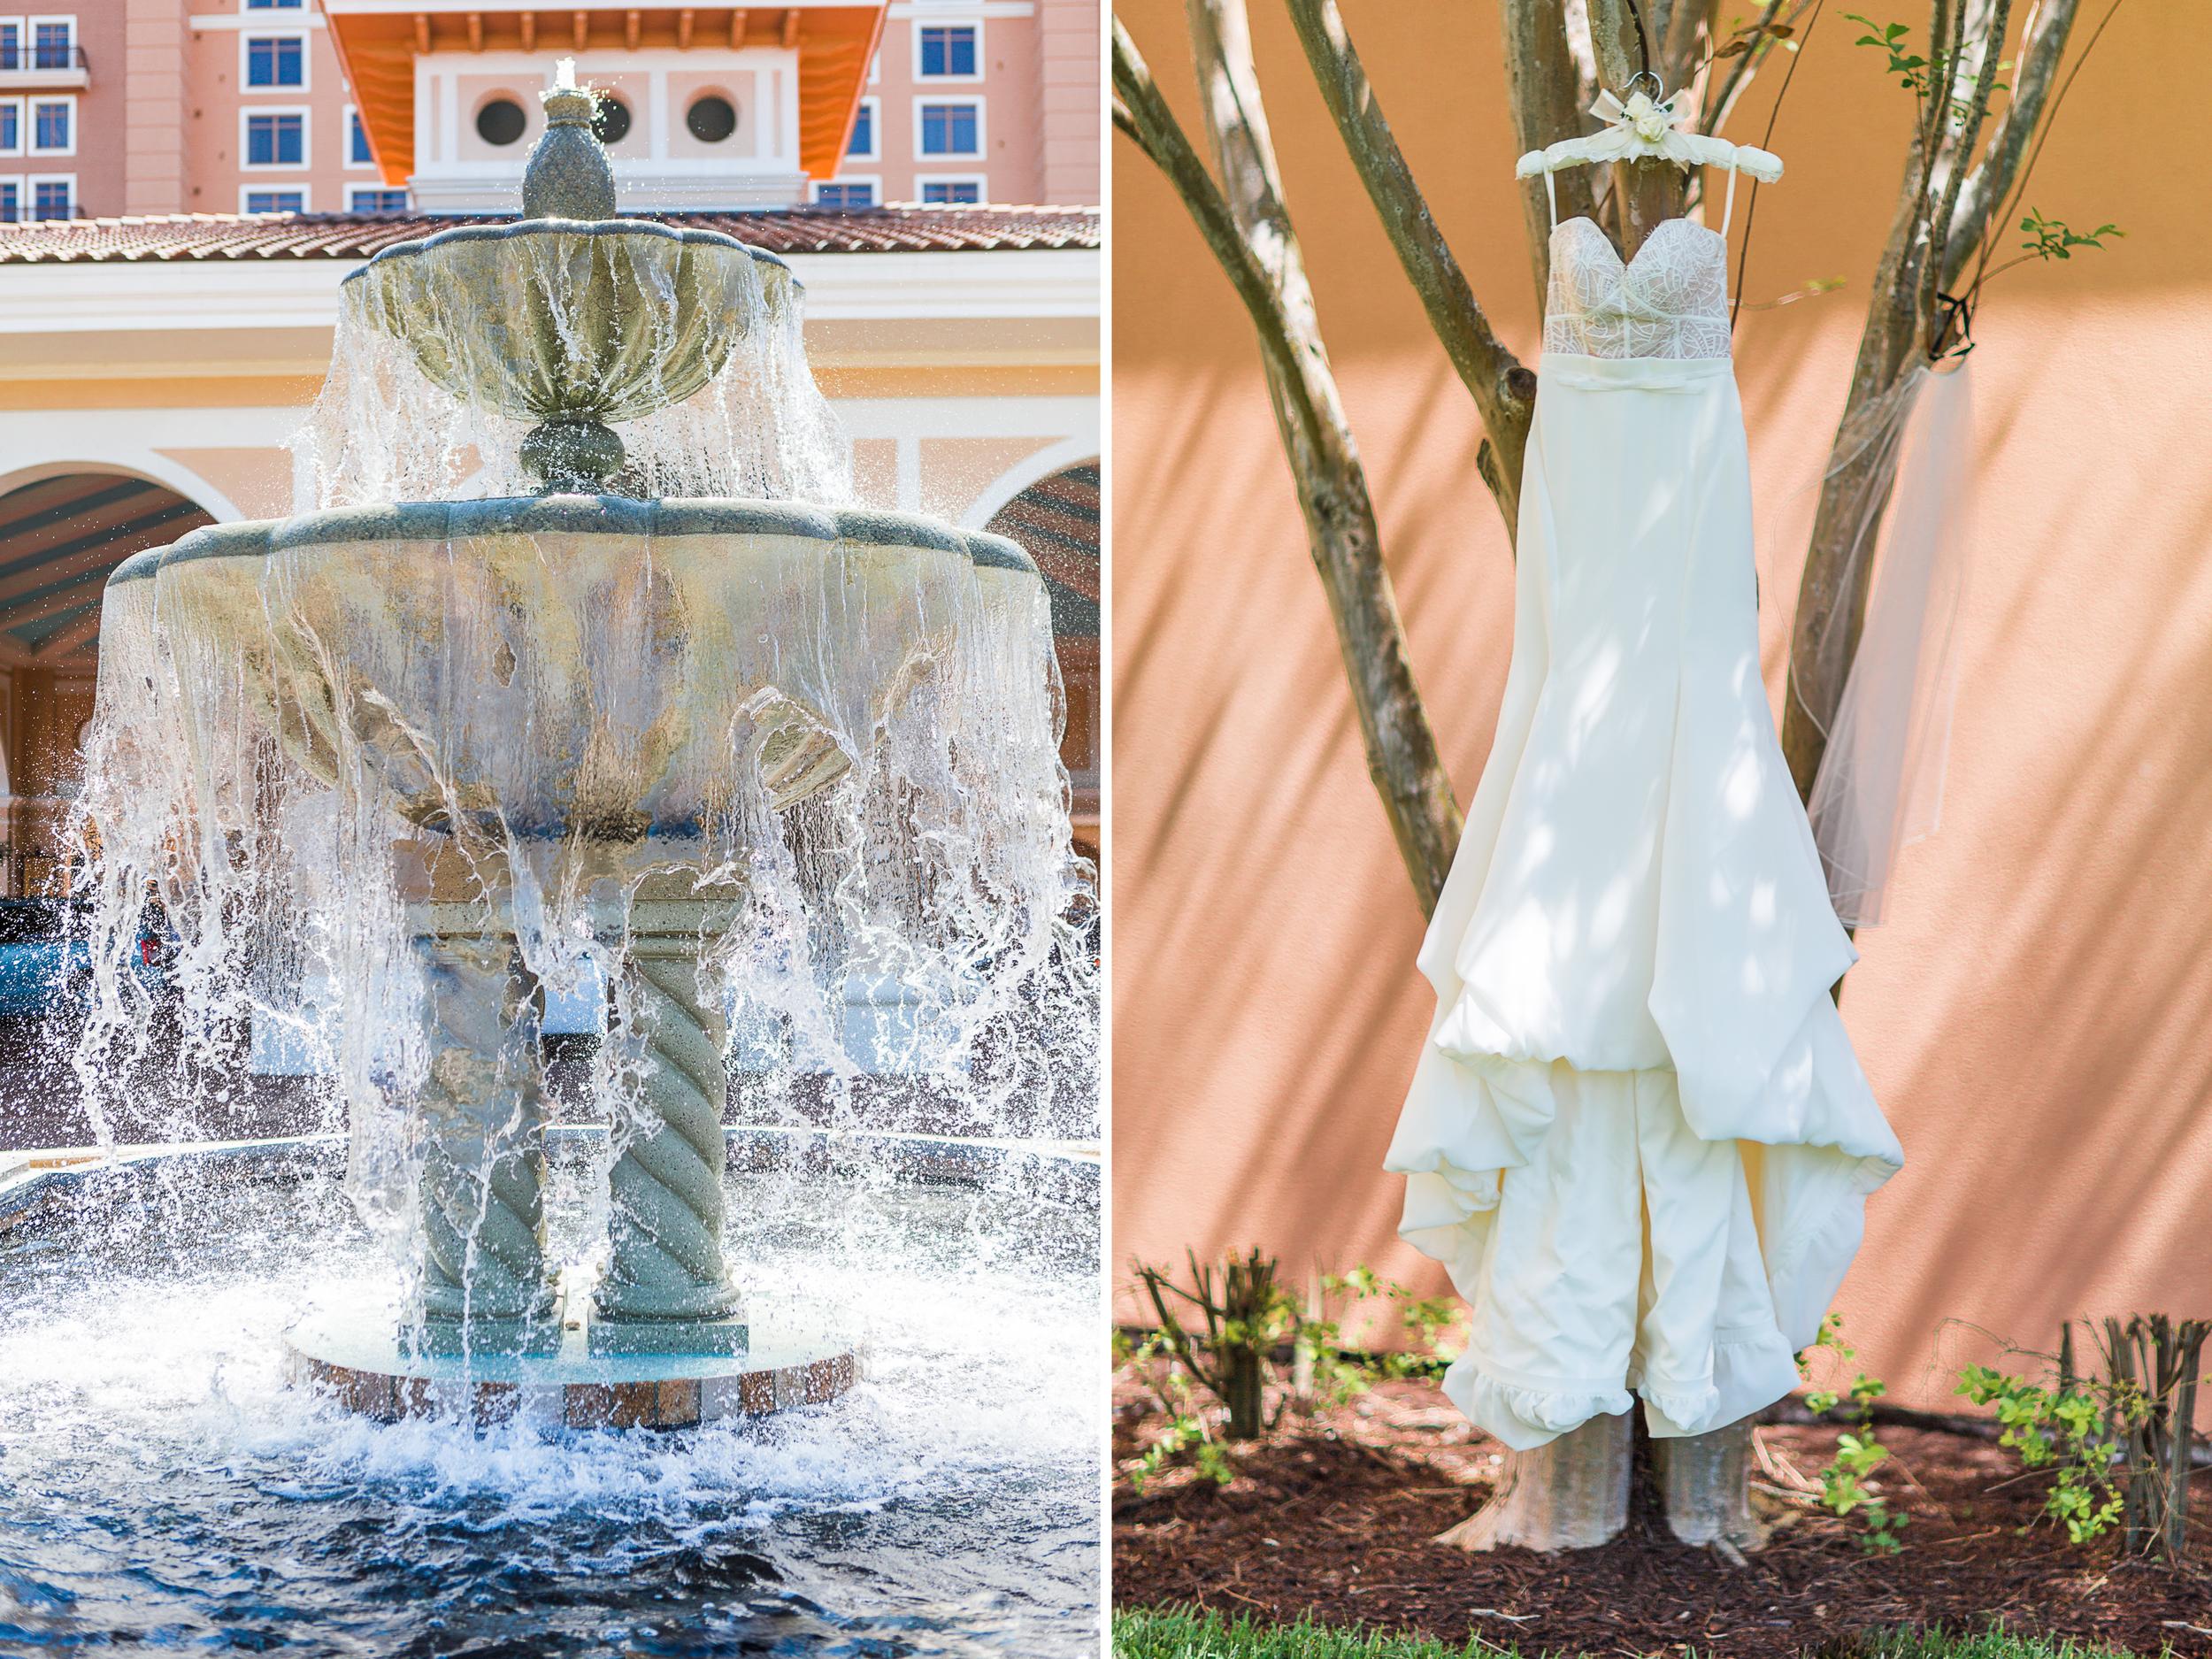 Allie & David Shingle Creek wedding - fountain and mermaid wedding gown diptych mastin.jpg